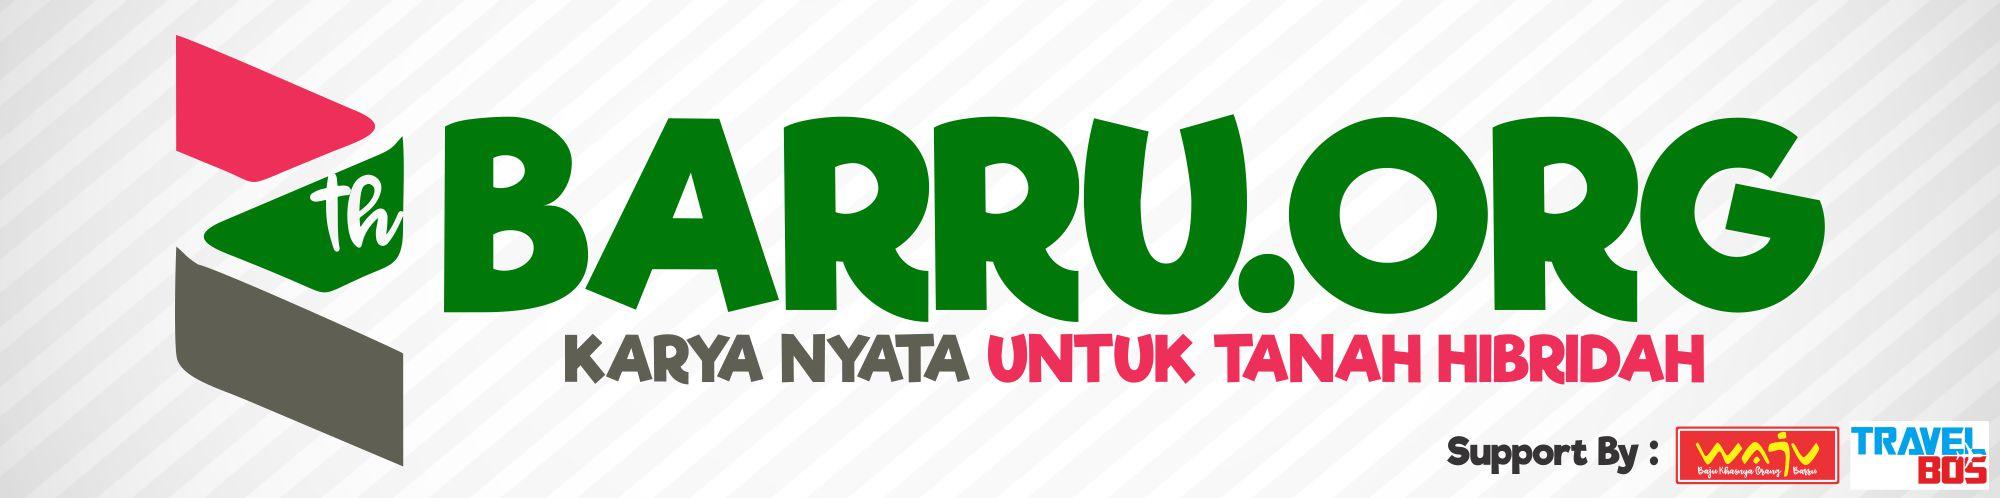 Barru.Org-Banner